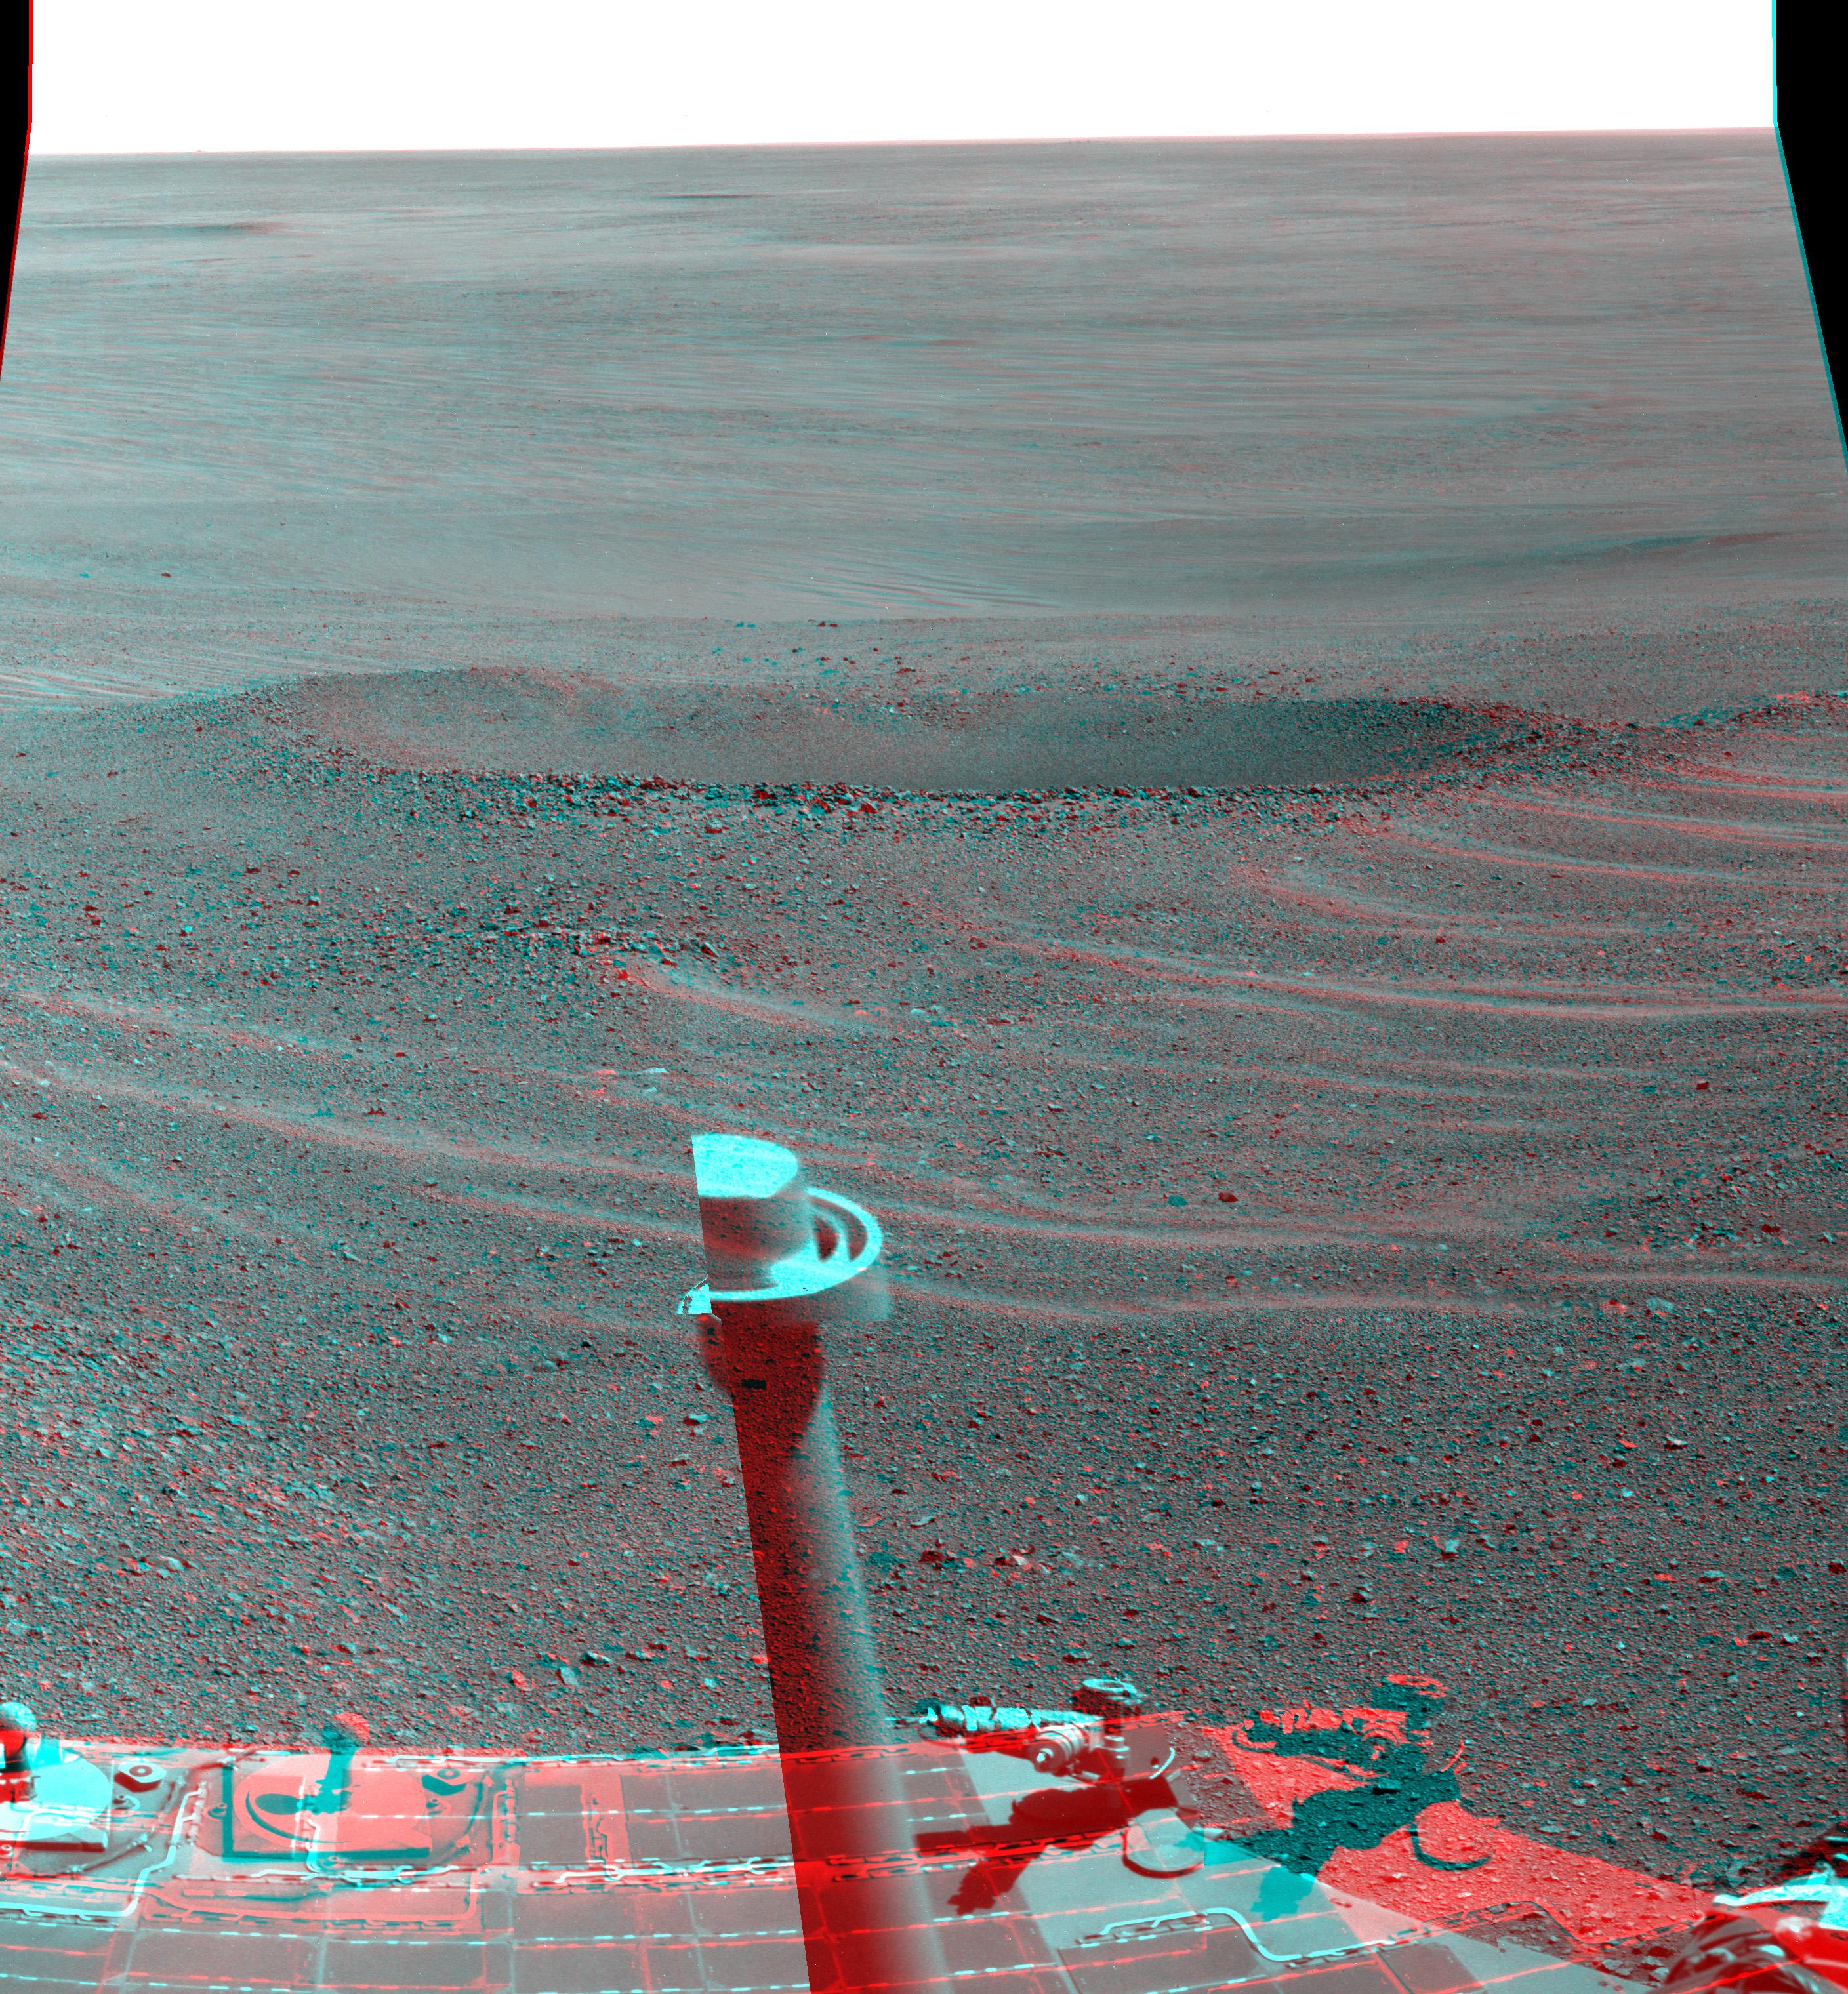 nasa lies about mars - photo #38